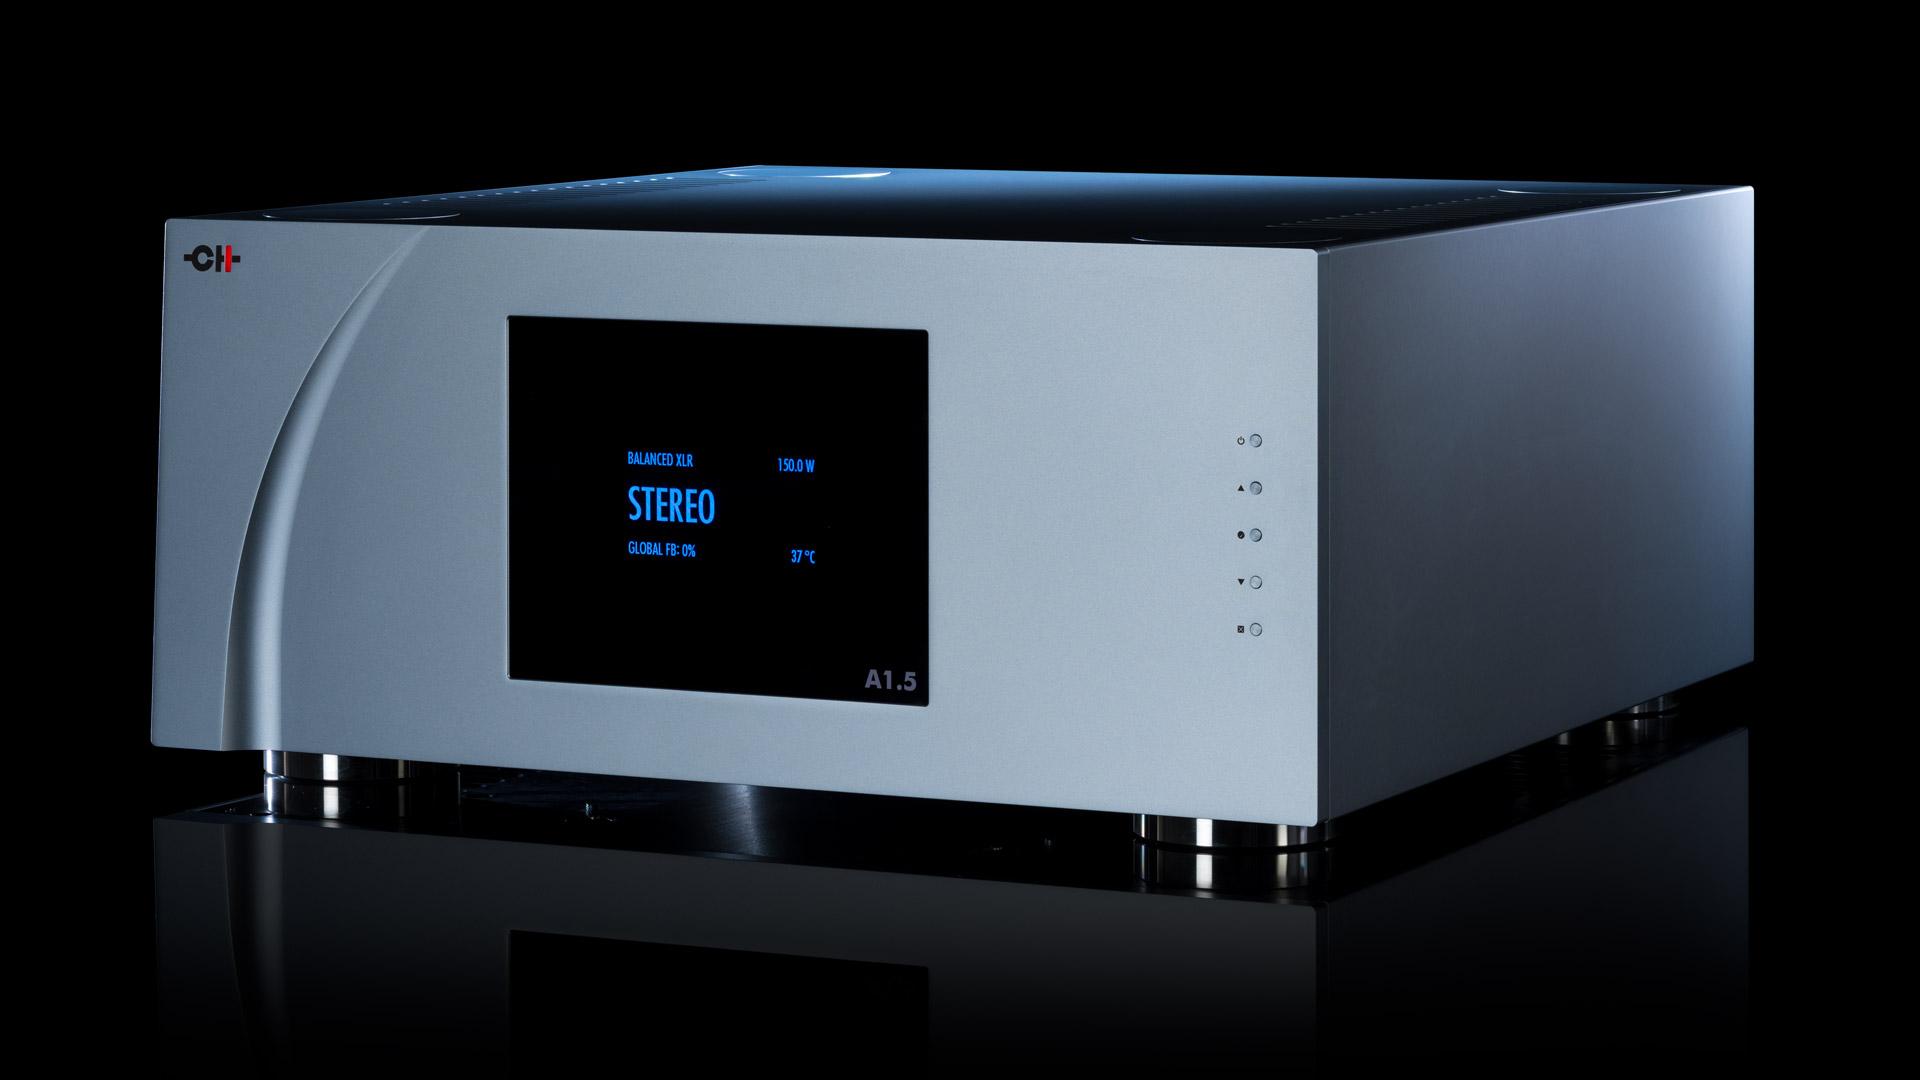 CH-Precision-A1.5-Power-Amplifier-5